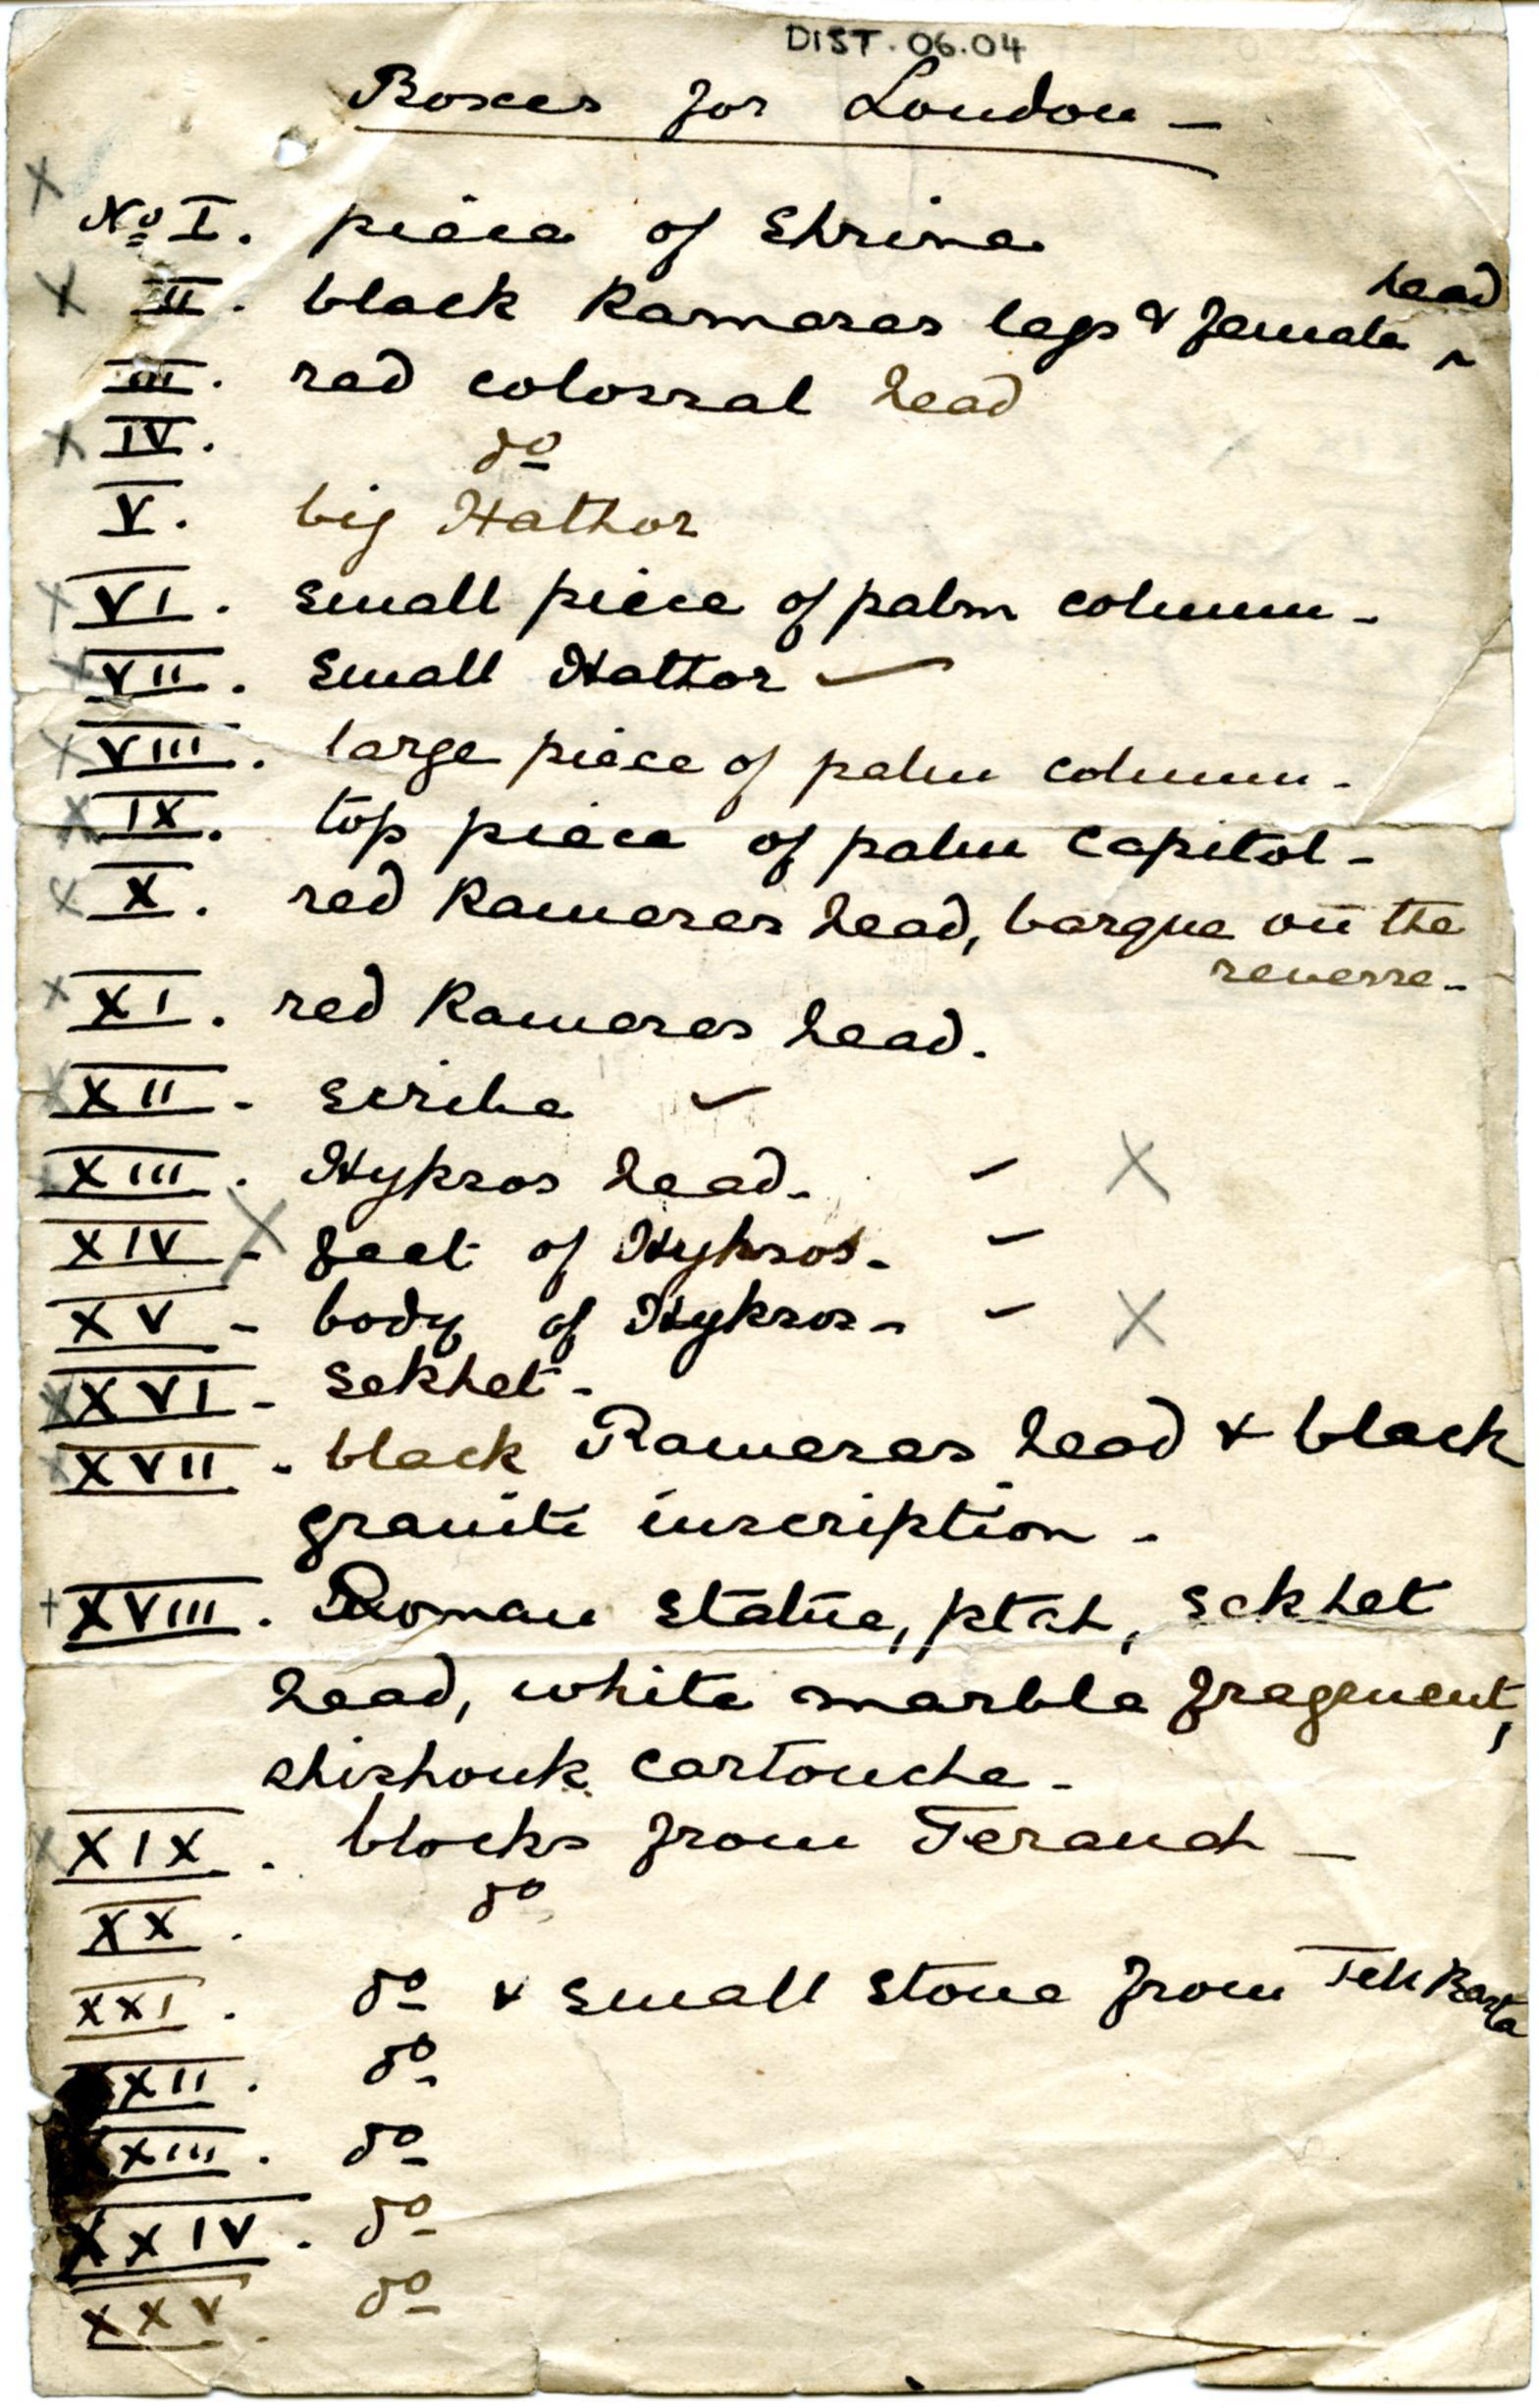 1887-1889 Tell el-Yahudiya, Teranneh, Heliopolis, Bubastis DIST.06.04a